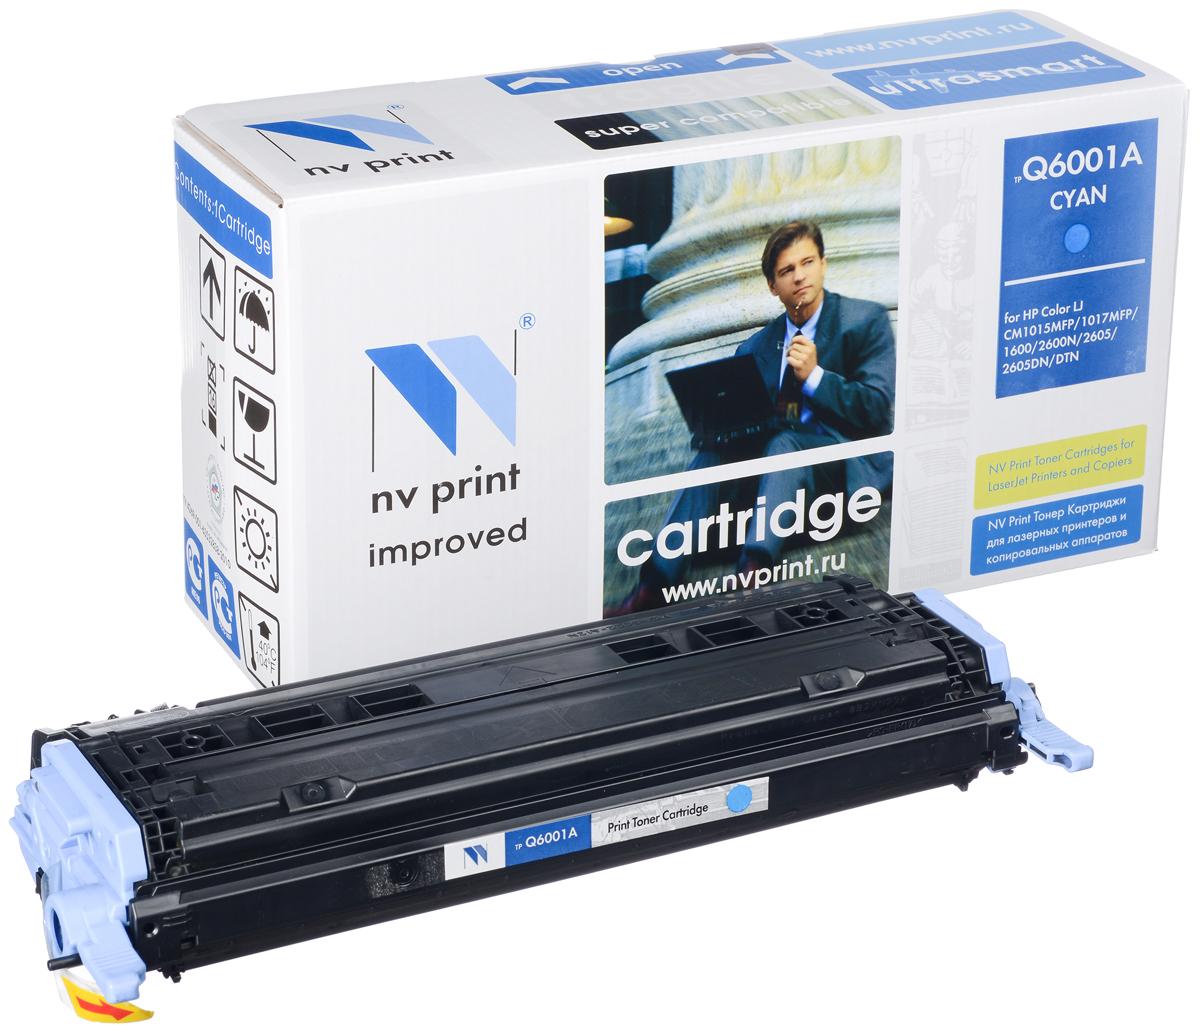 NV Print Q6001A/CAN707C, Cyan тонер-картридж для HP Color LJ CM1015MFP/CM1017MFP1600/2600N/2605/Canon LBP 5000